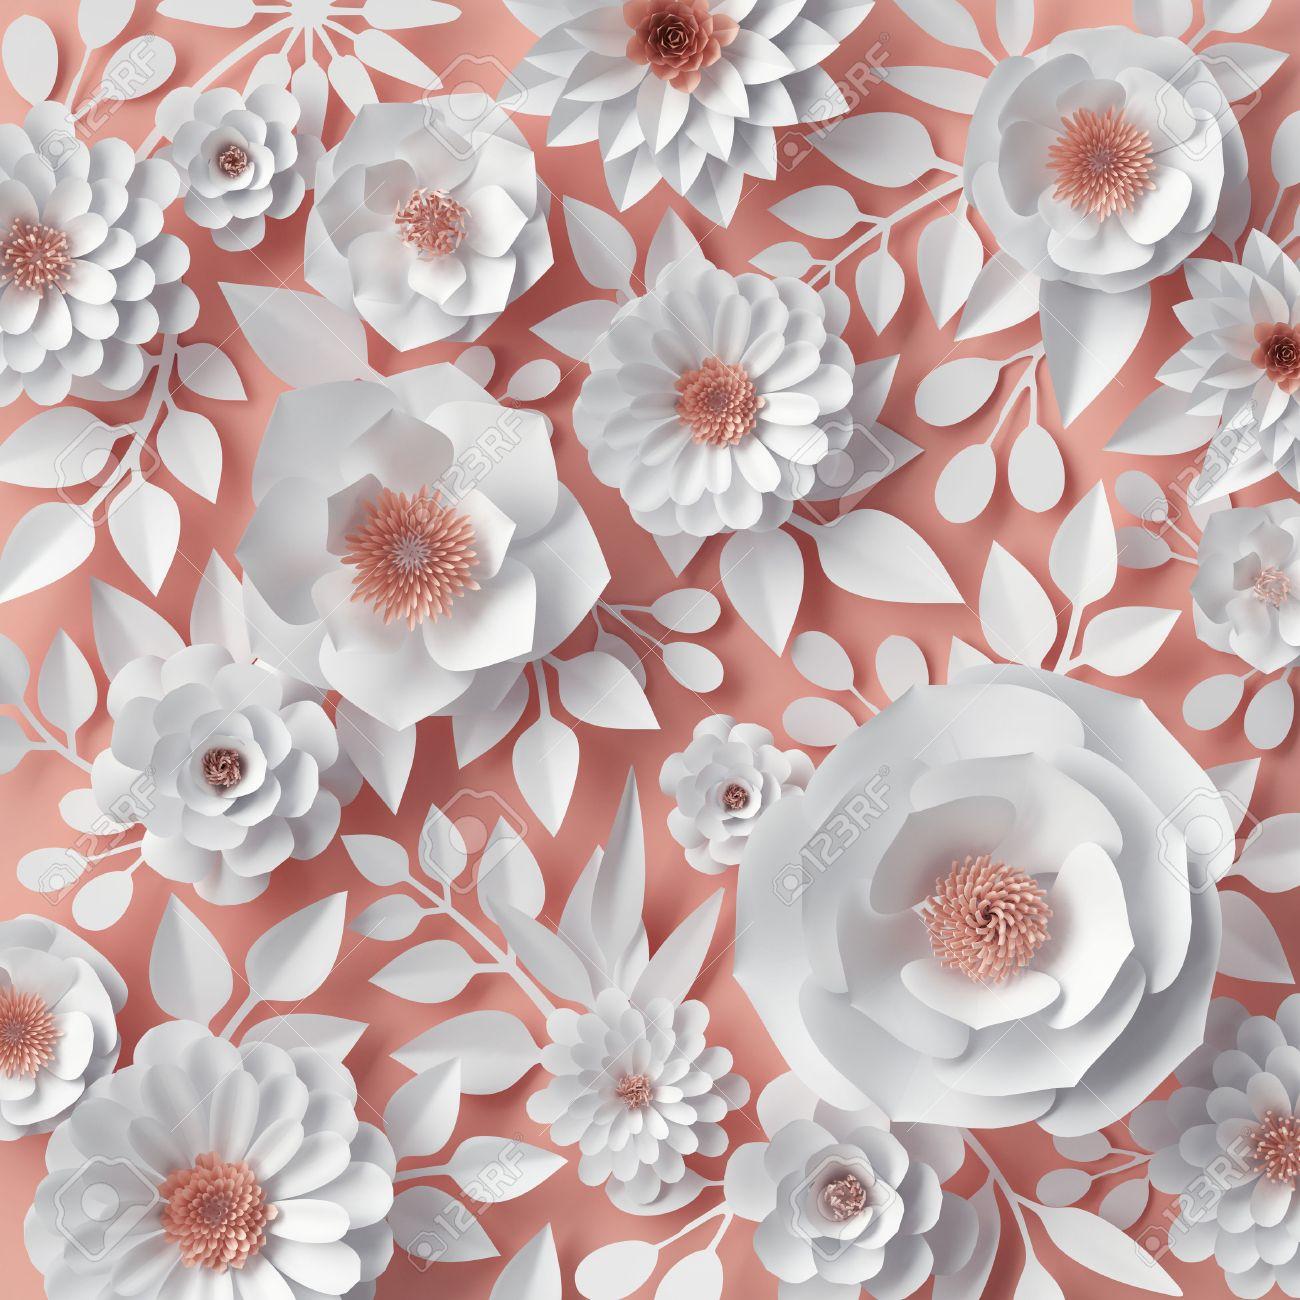 3d render digital illustration white paper flowers bridal stock 3d render digital illustration white paper flowers bridal bouquet wedding card izmirmasajfo